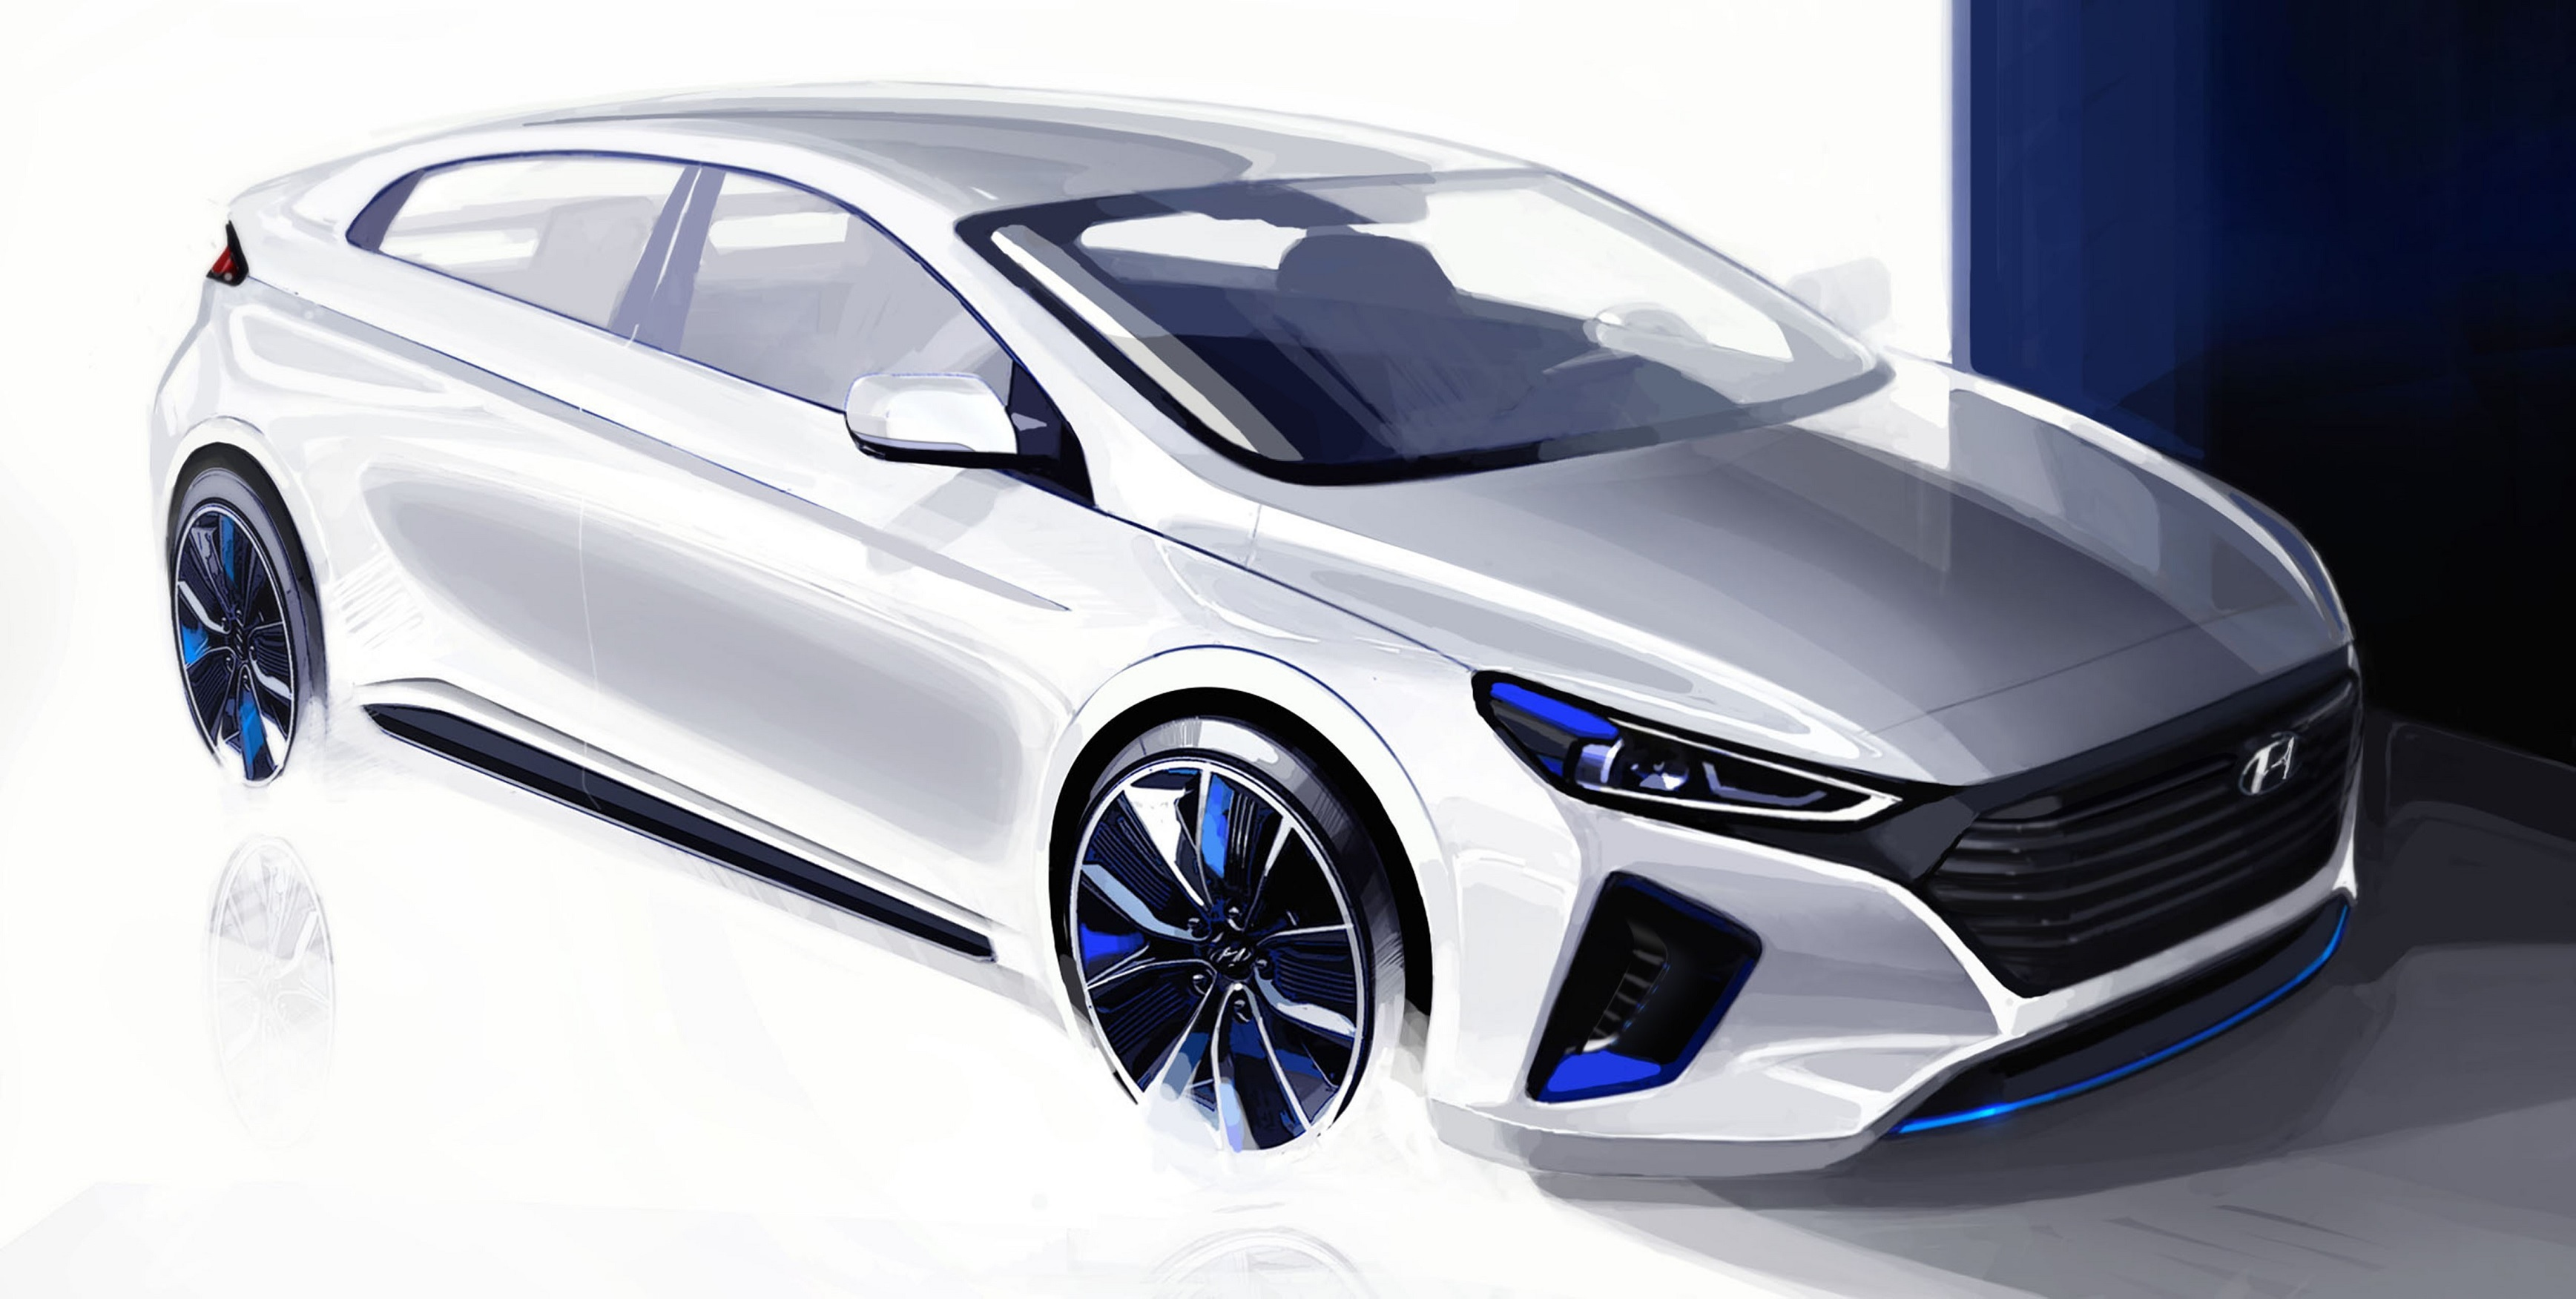 Hyundai IONIQ: due nuovi rendering